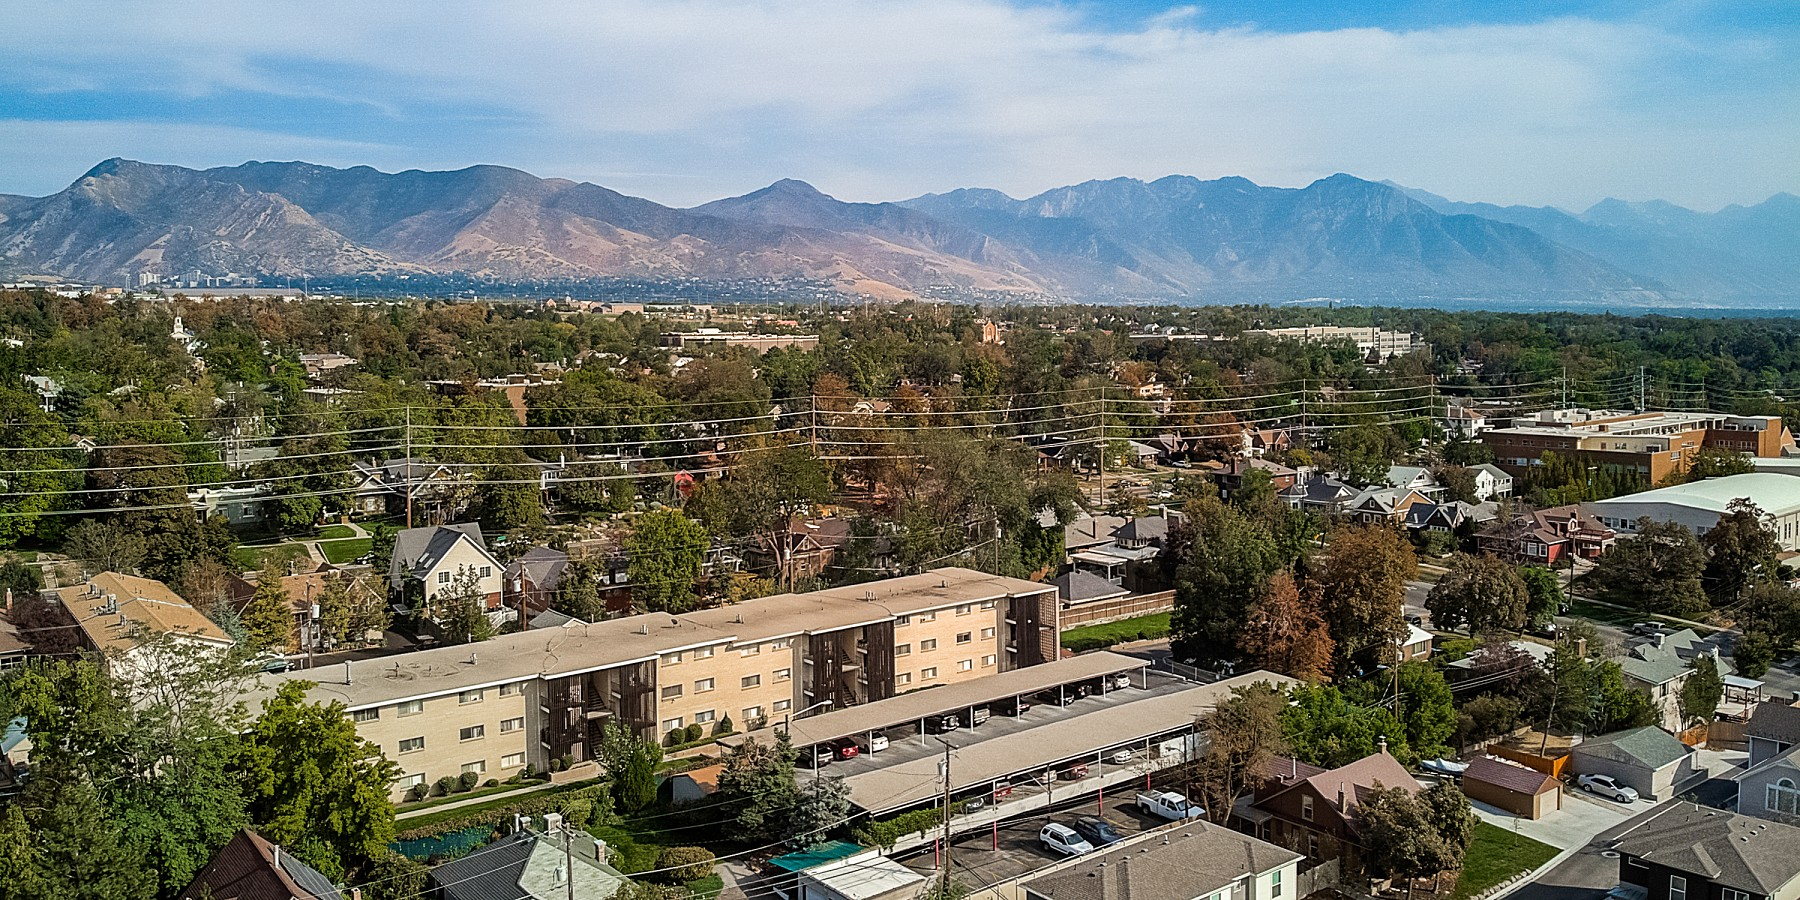 515 South 1000 East #1104, Salt Lake City, UT 84102